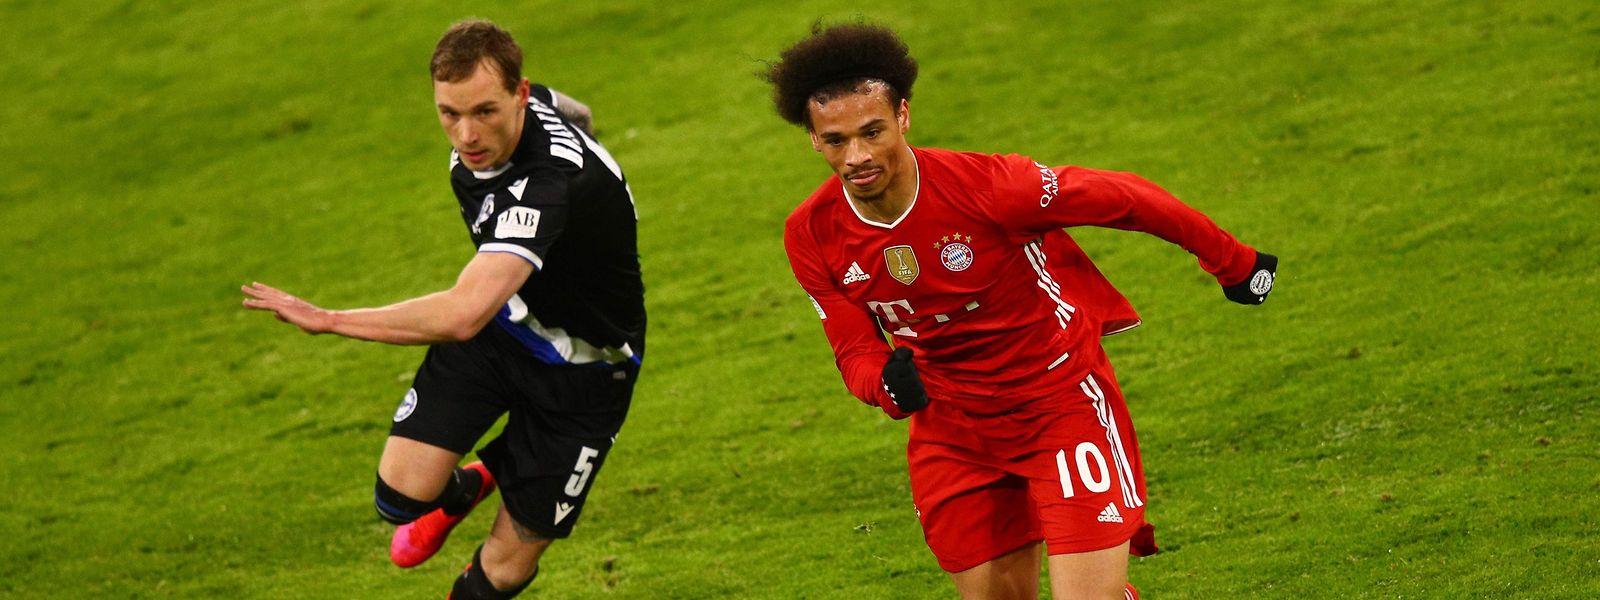 Bayern Münchens Leroy Sané (r.) und Bielefelds Jacob Barrett Laursen jagen dem Ball hinterher.